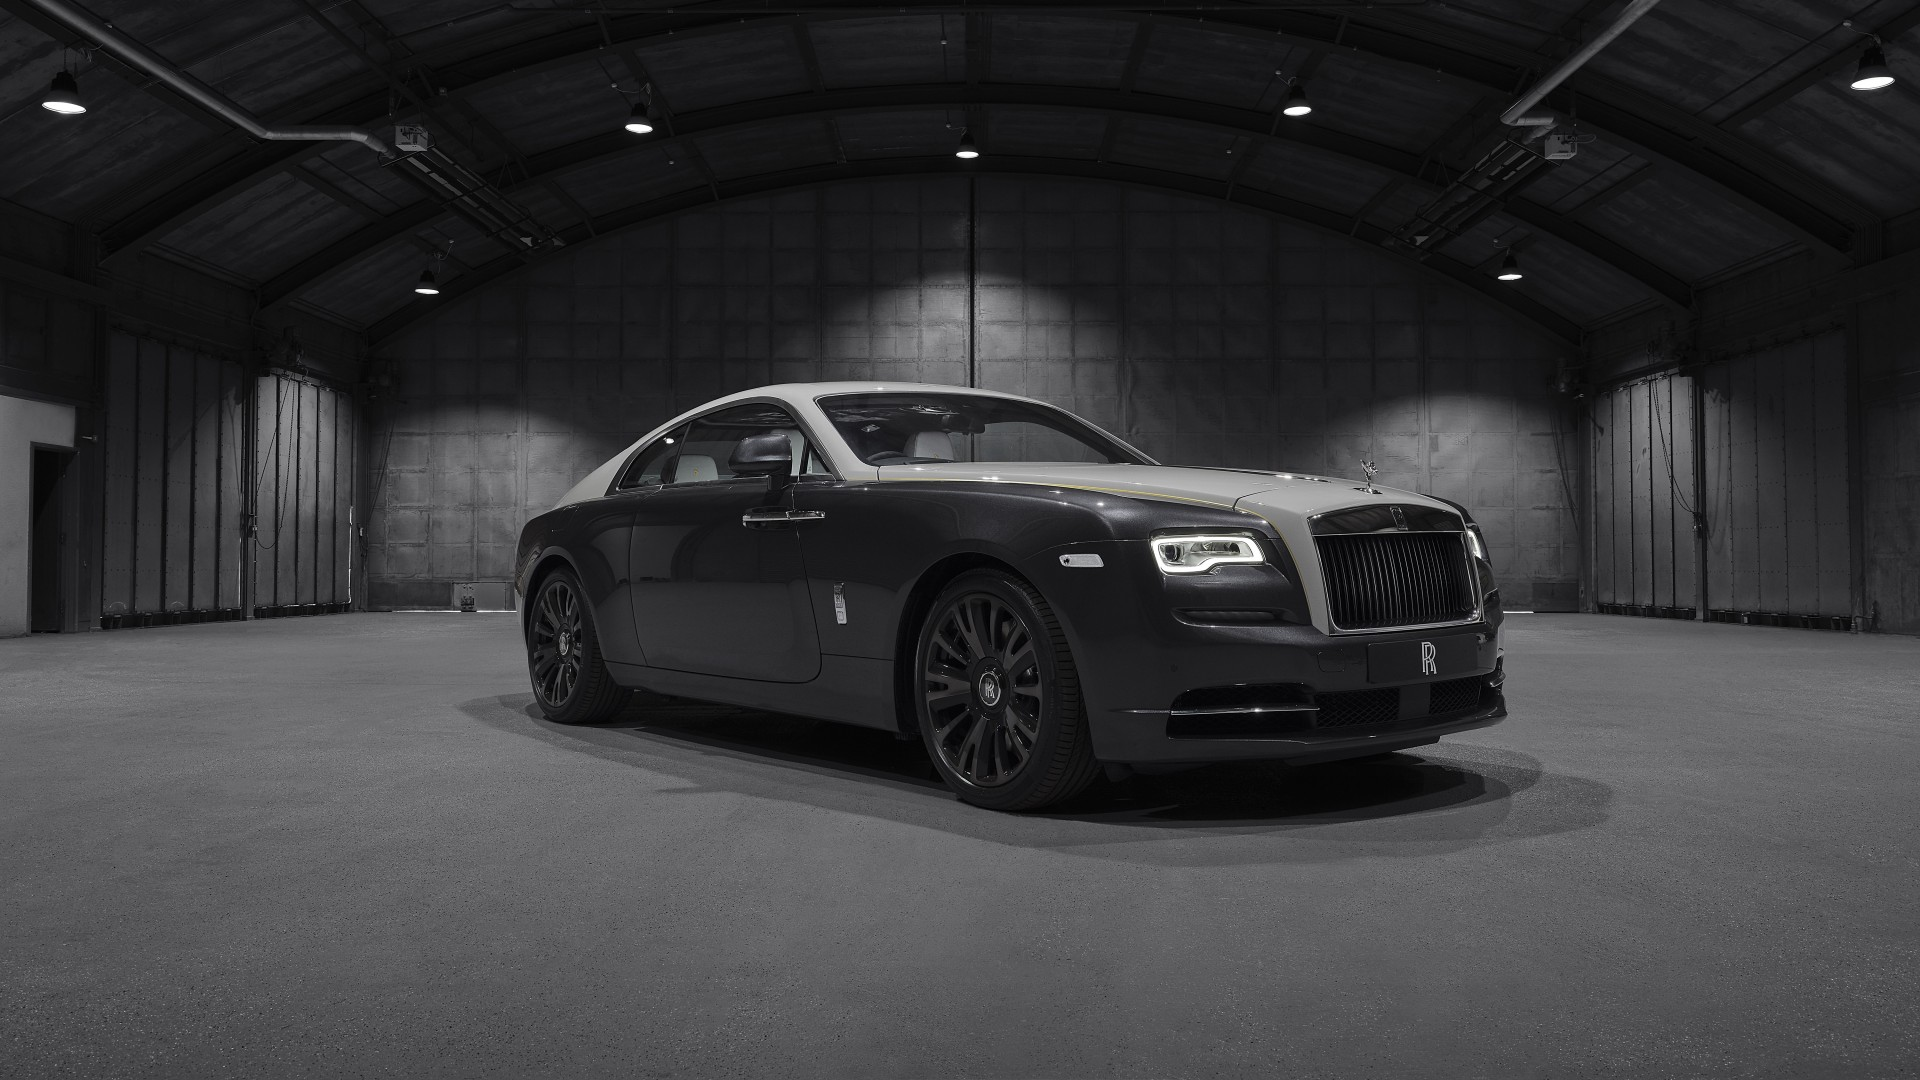 2016 Rolls Royce Ghost >> Rolls-Royce Wraith Eagle VIII 2019 5K Wallpaper | HD Car ...